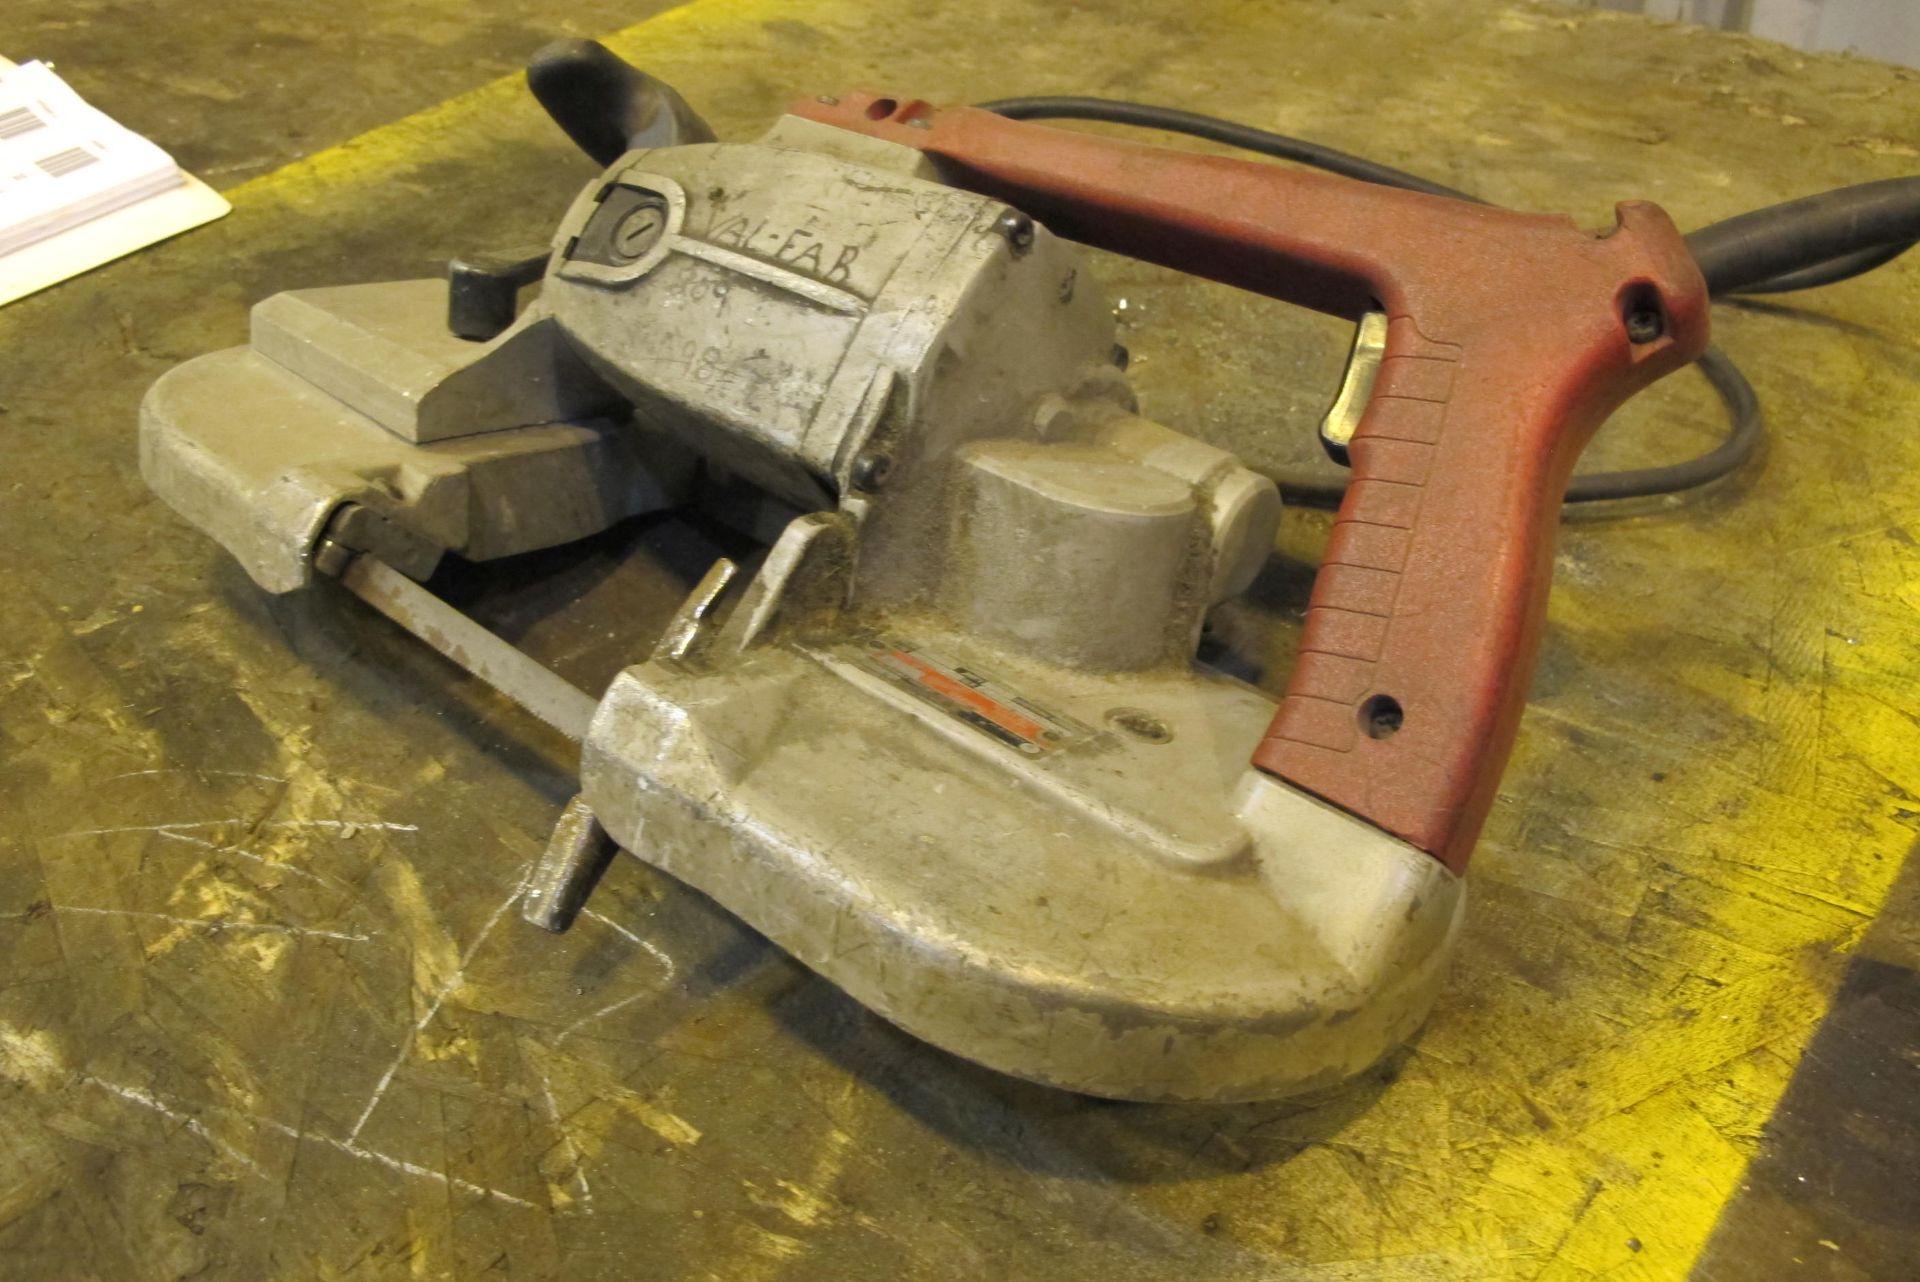 Milwaukee Cat #6225 Heavy Duty bandsaw - Image 3 of 3